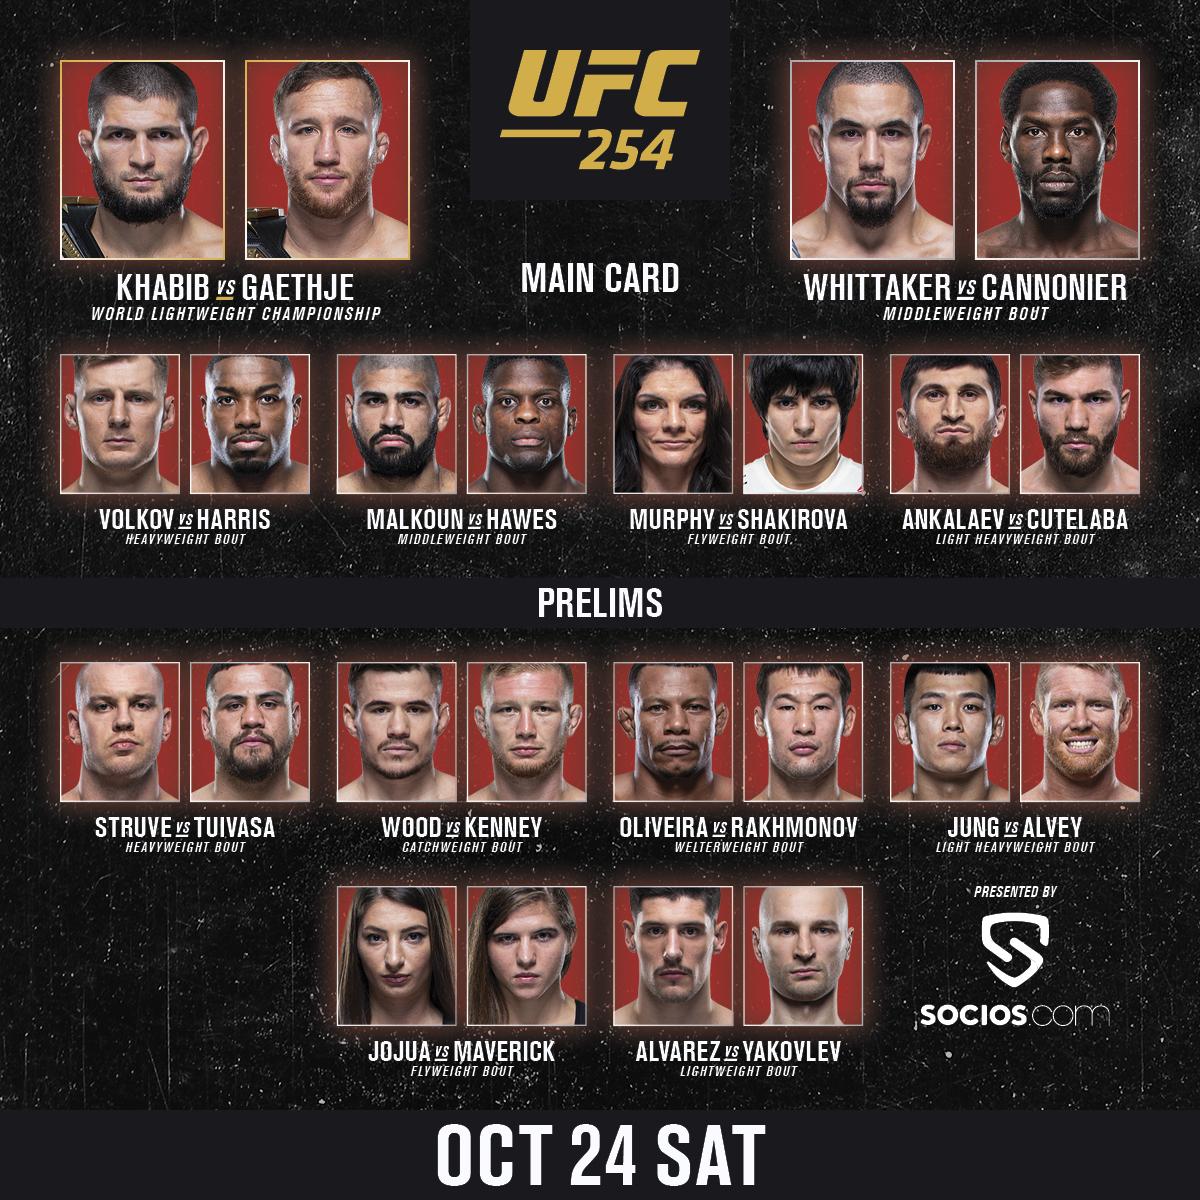 MAKE YOUR PICKS!  Just a few hours until #UFC254 – Who you got?  #InAbuDhabi @VisitAbuDhabi https://t.co/40bxGkP1Q1